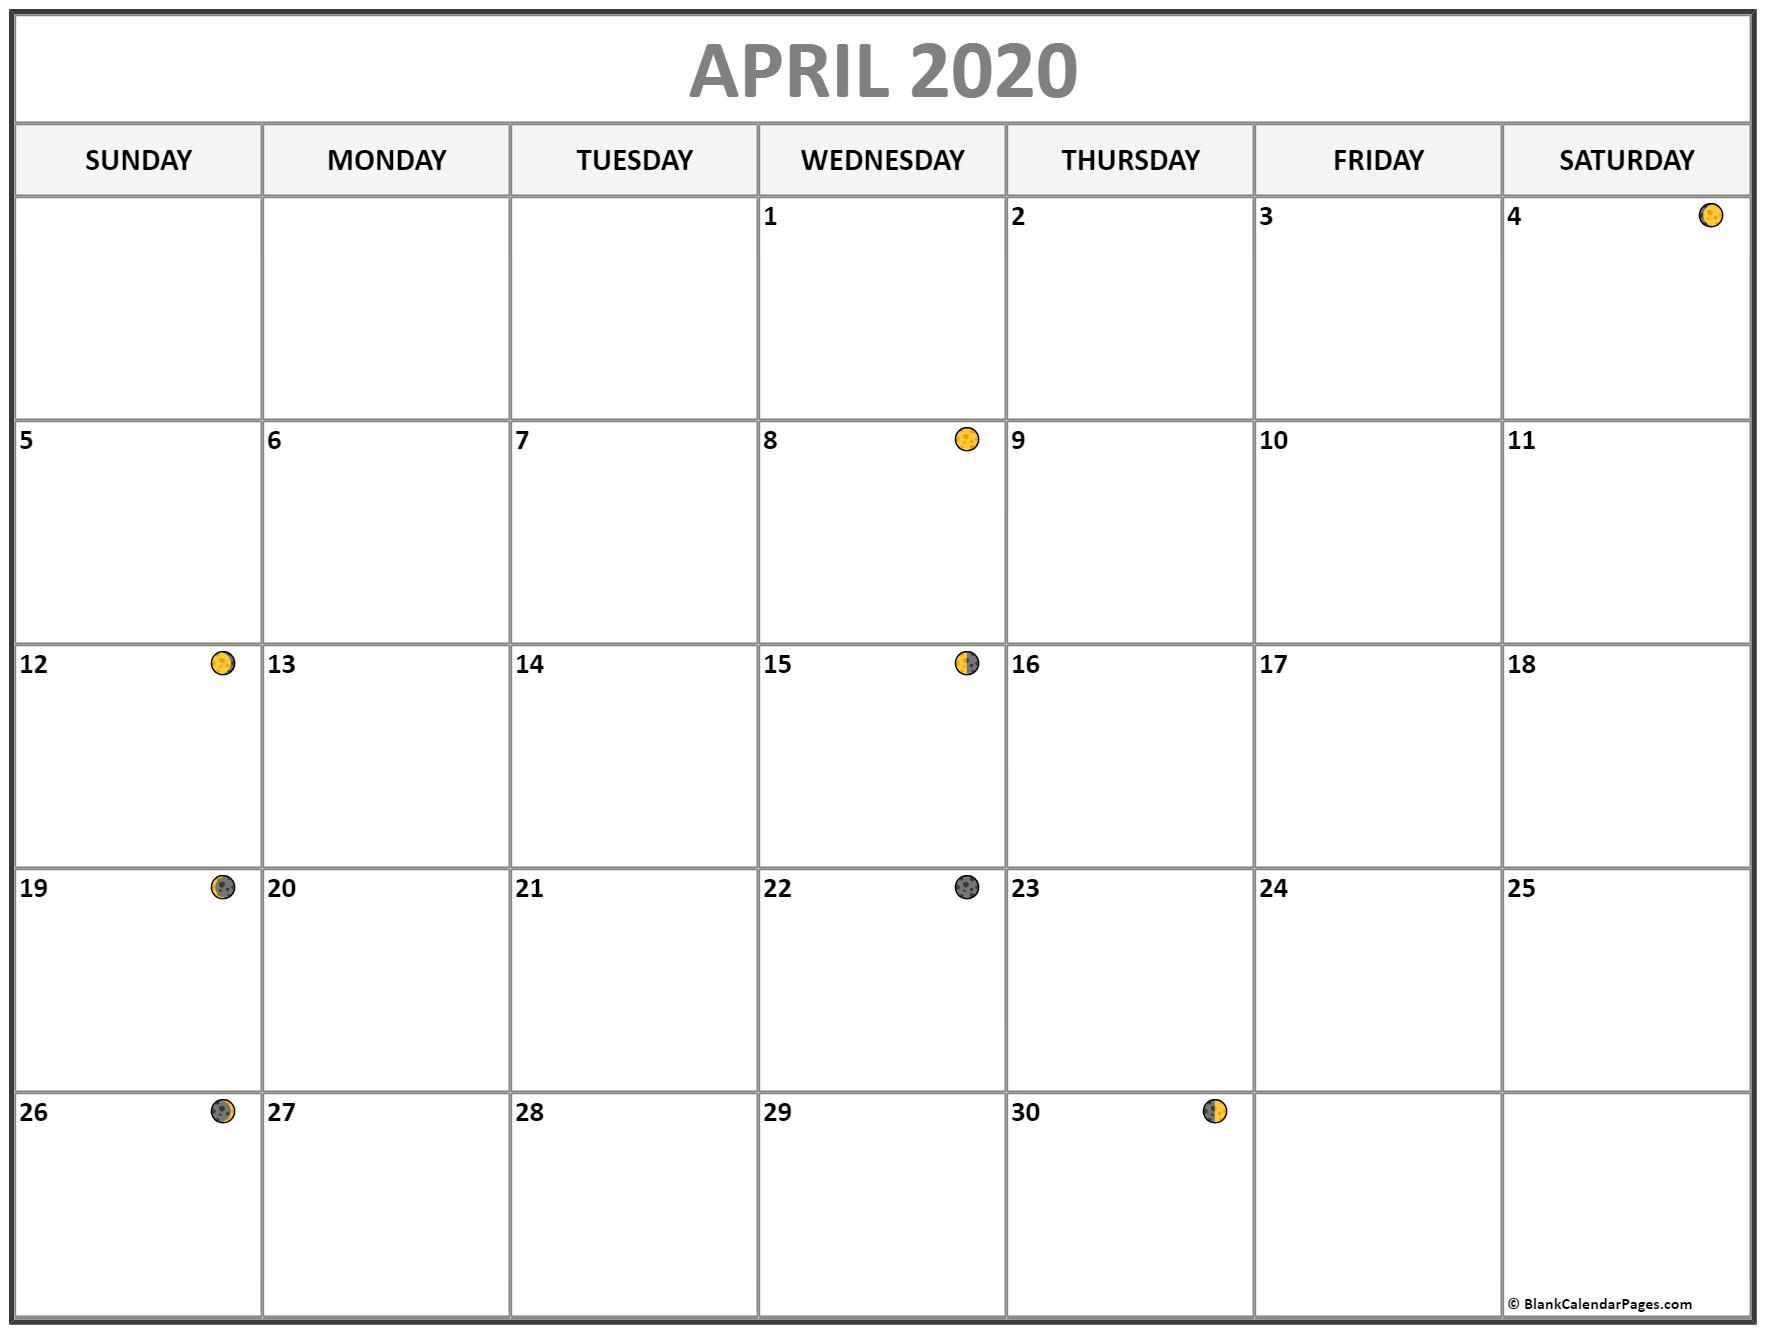 April 2020 Lunar Calendar | Moon Phase Calendar